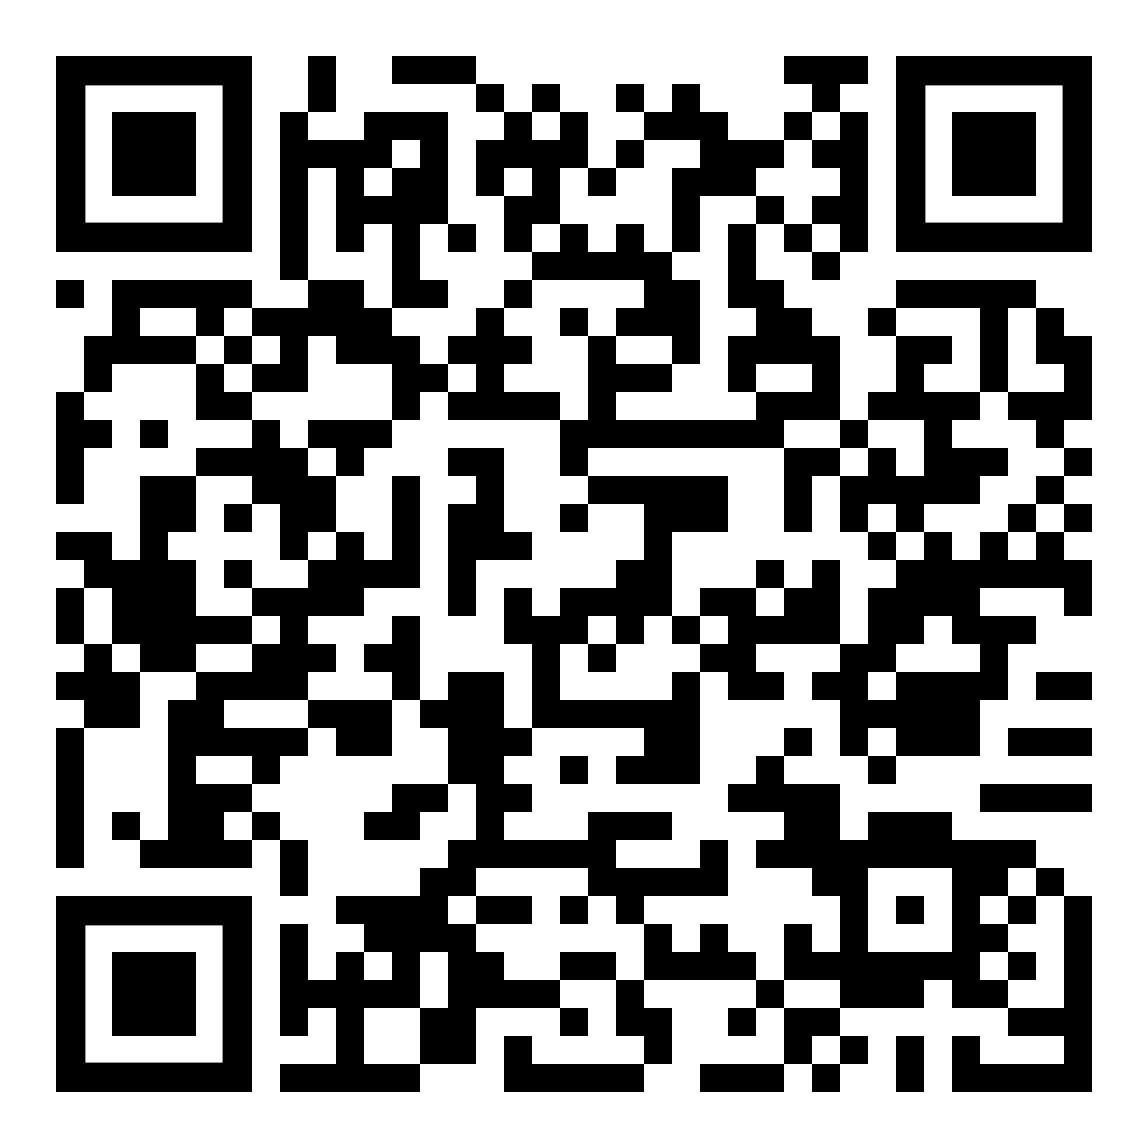 148490f6bb61be986efc7ff6b770e772bb0db7_.png